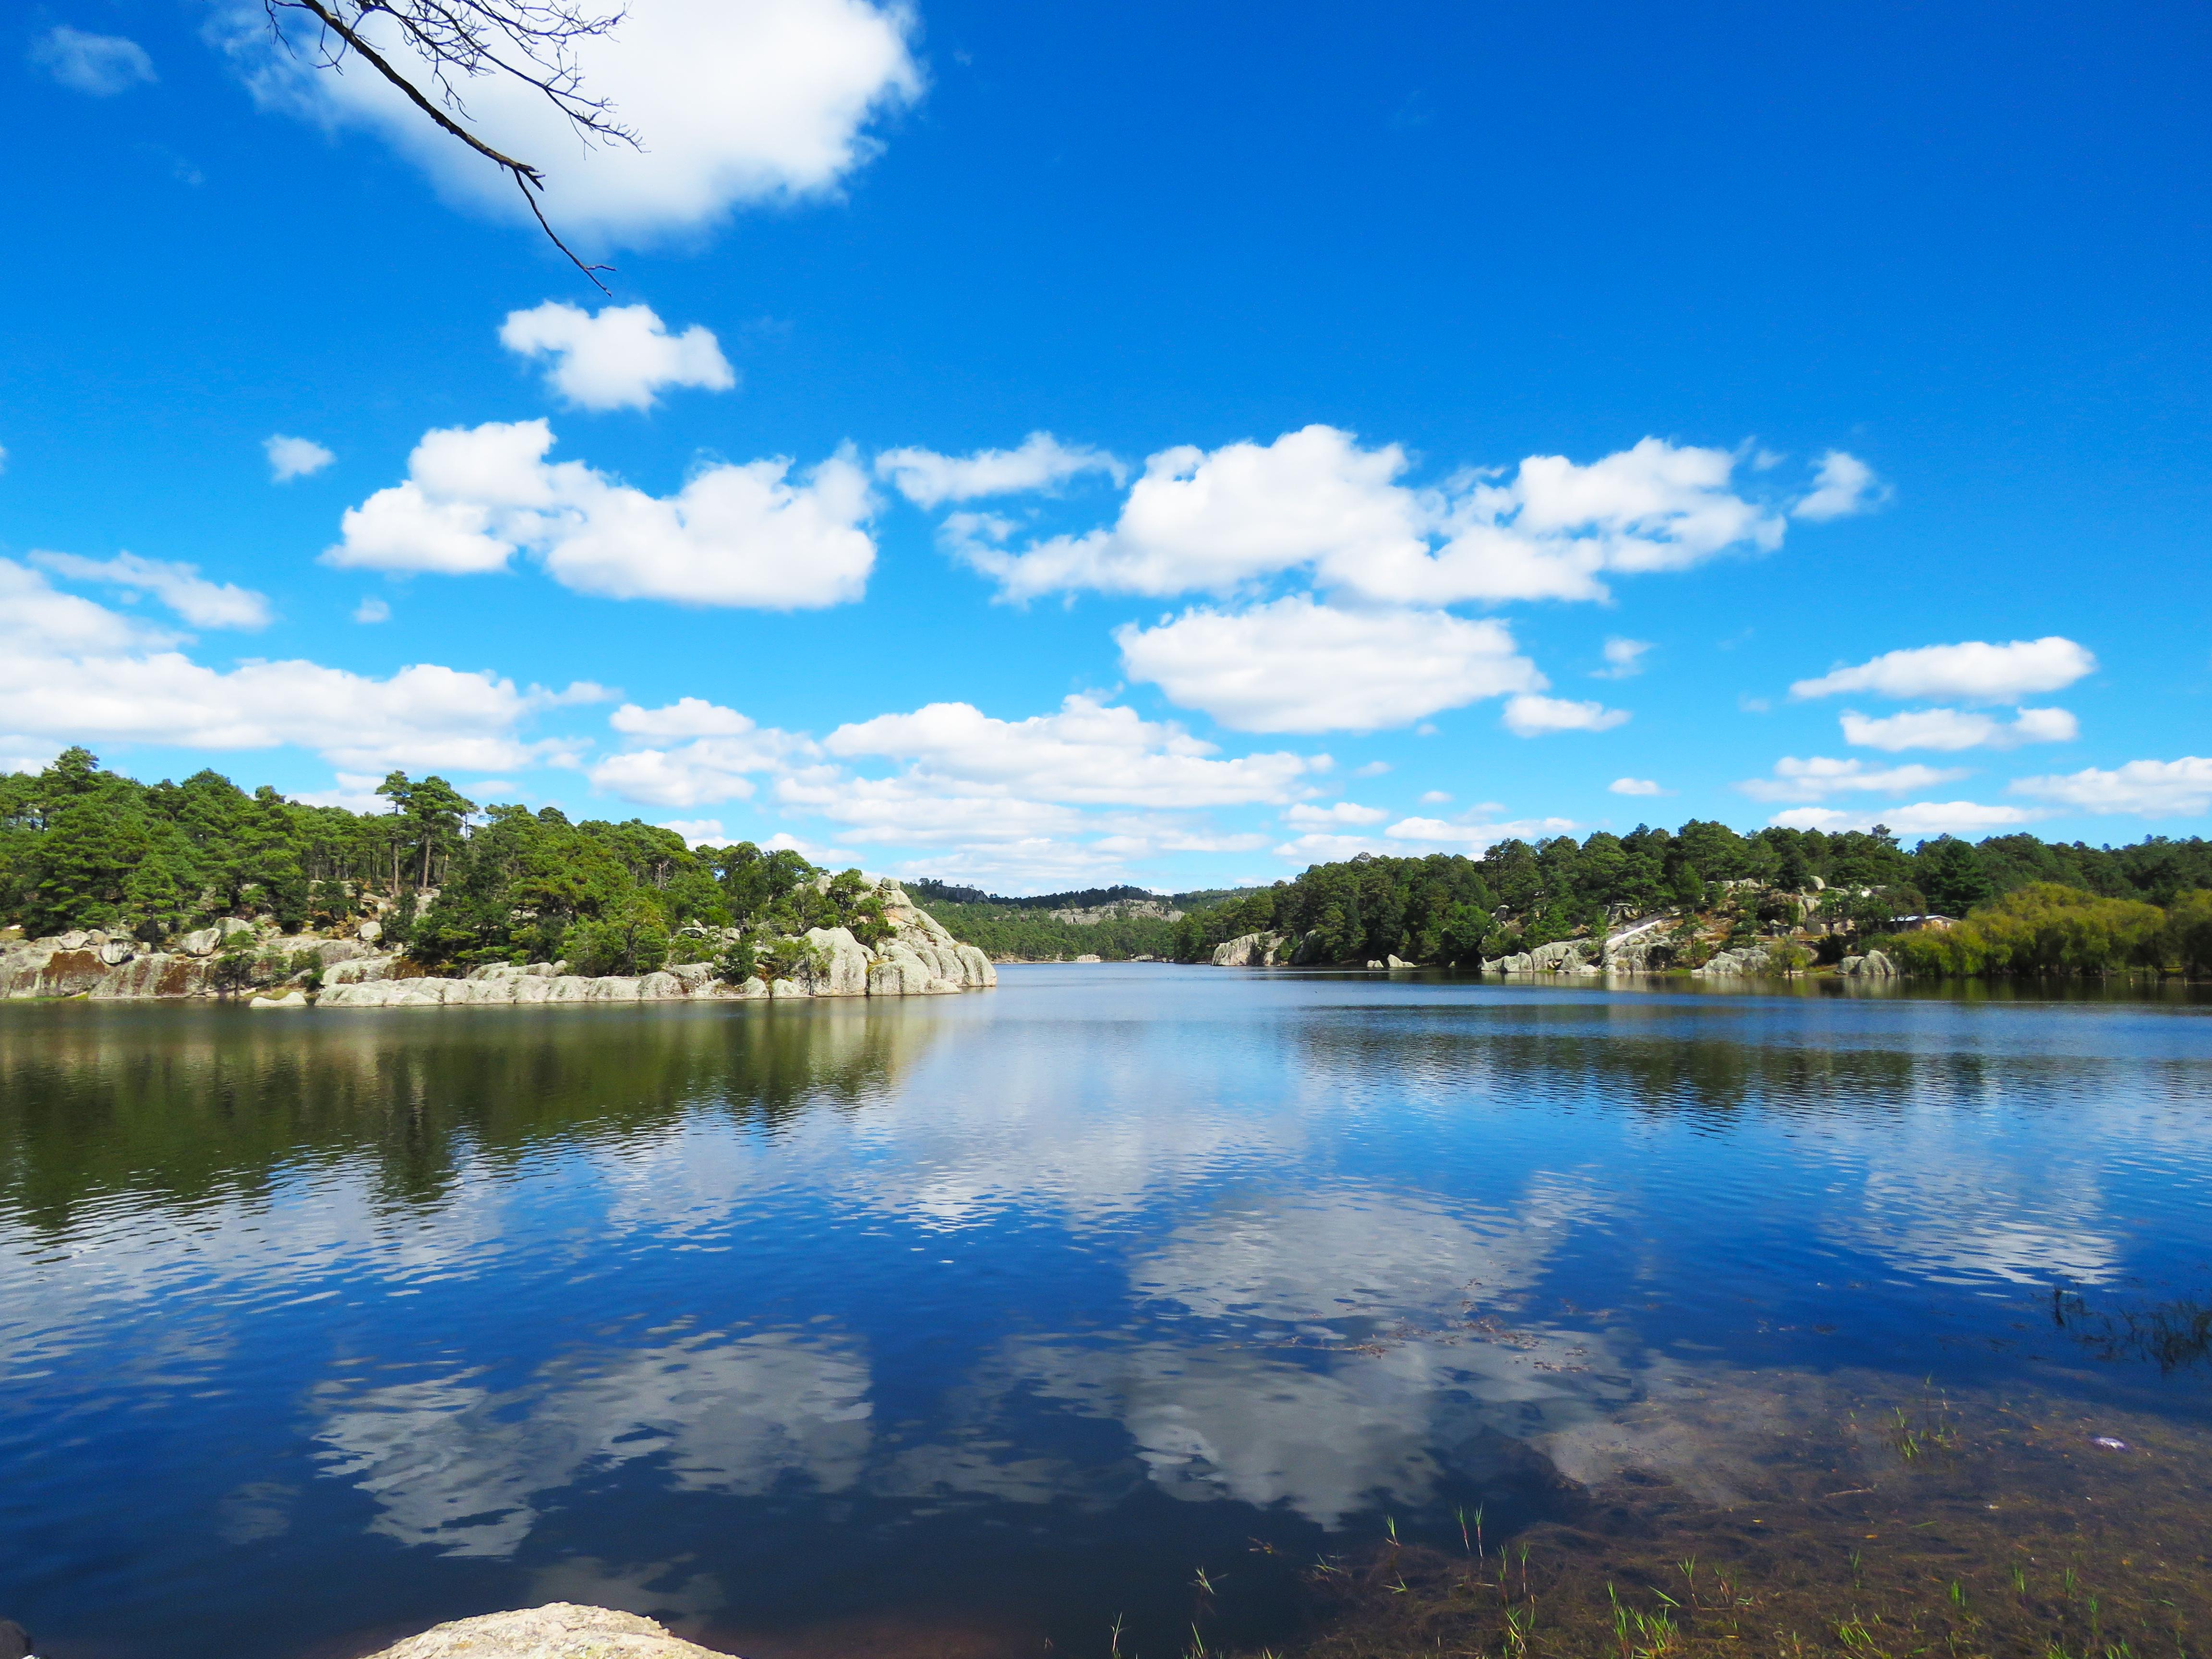 D08 Creel - Lago de Arareko